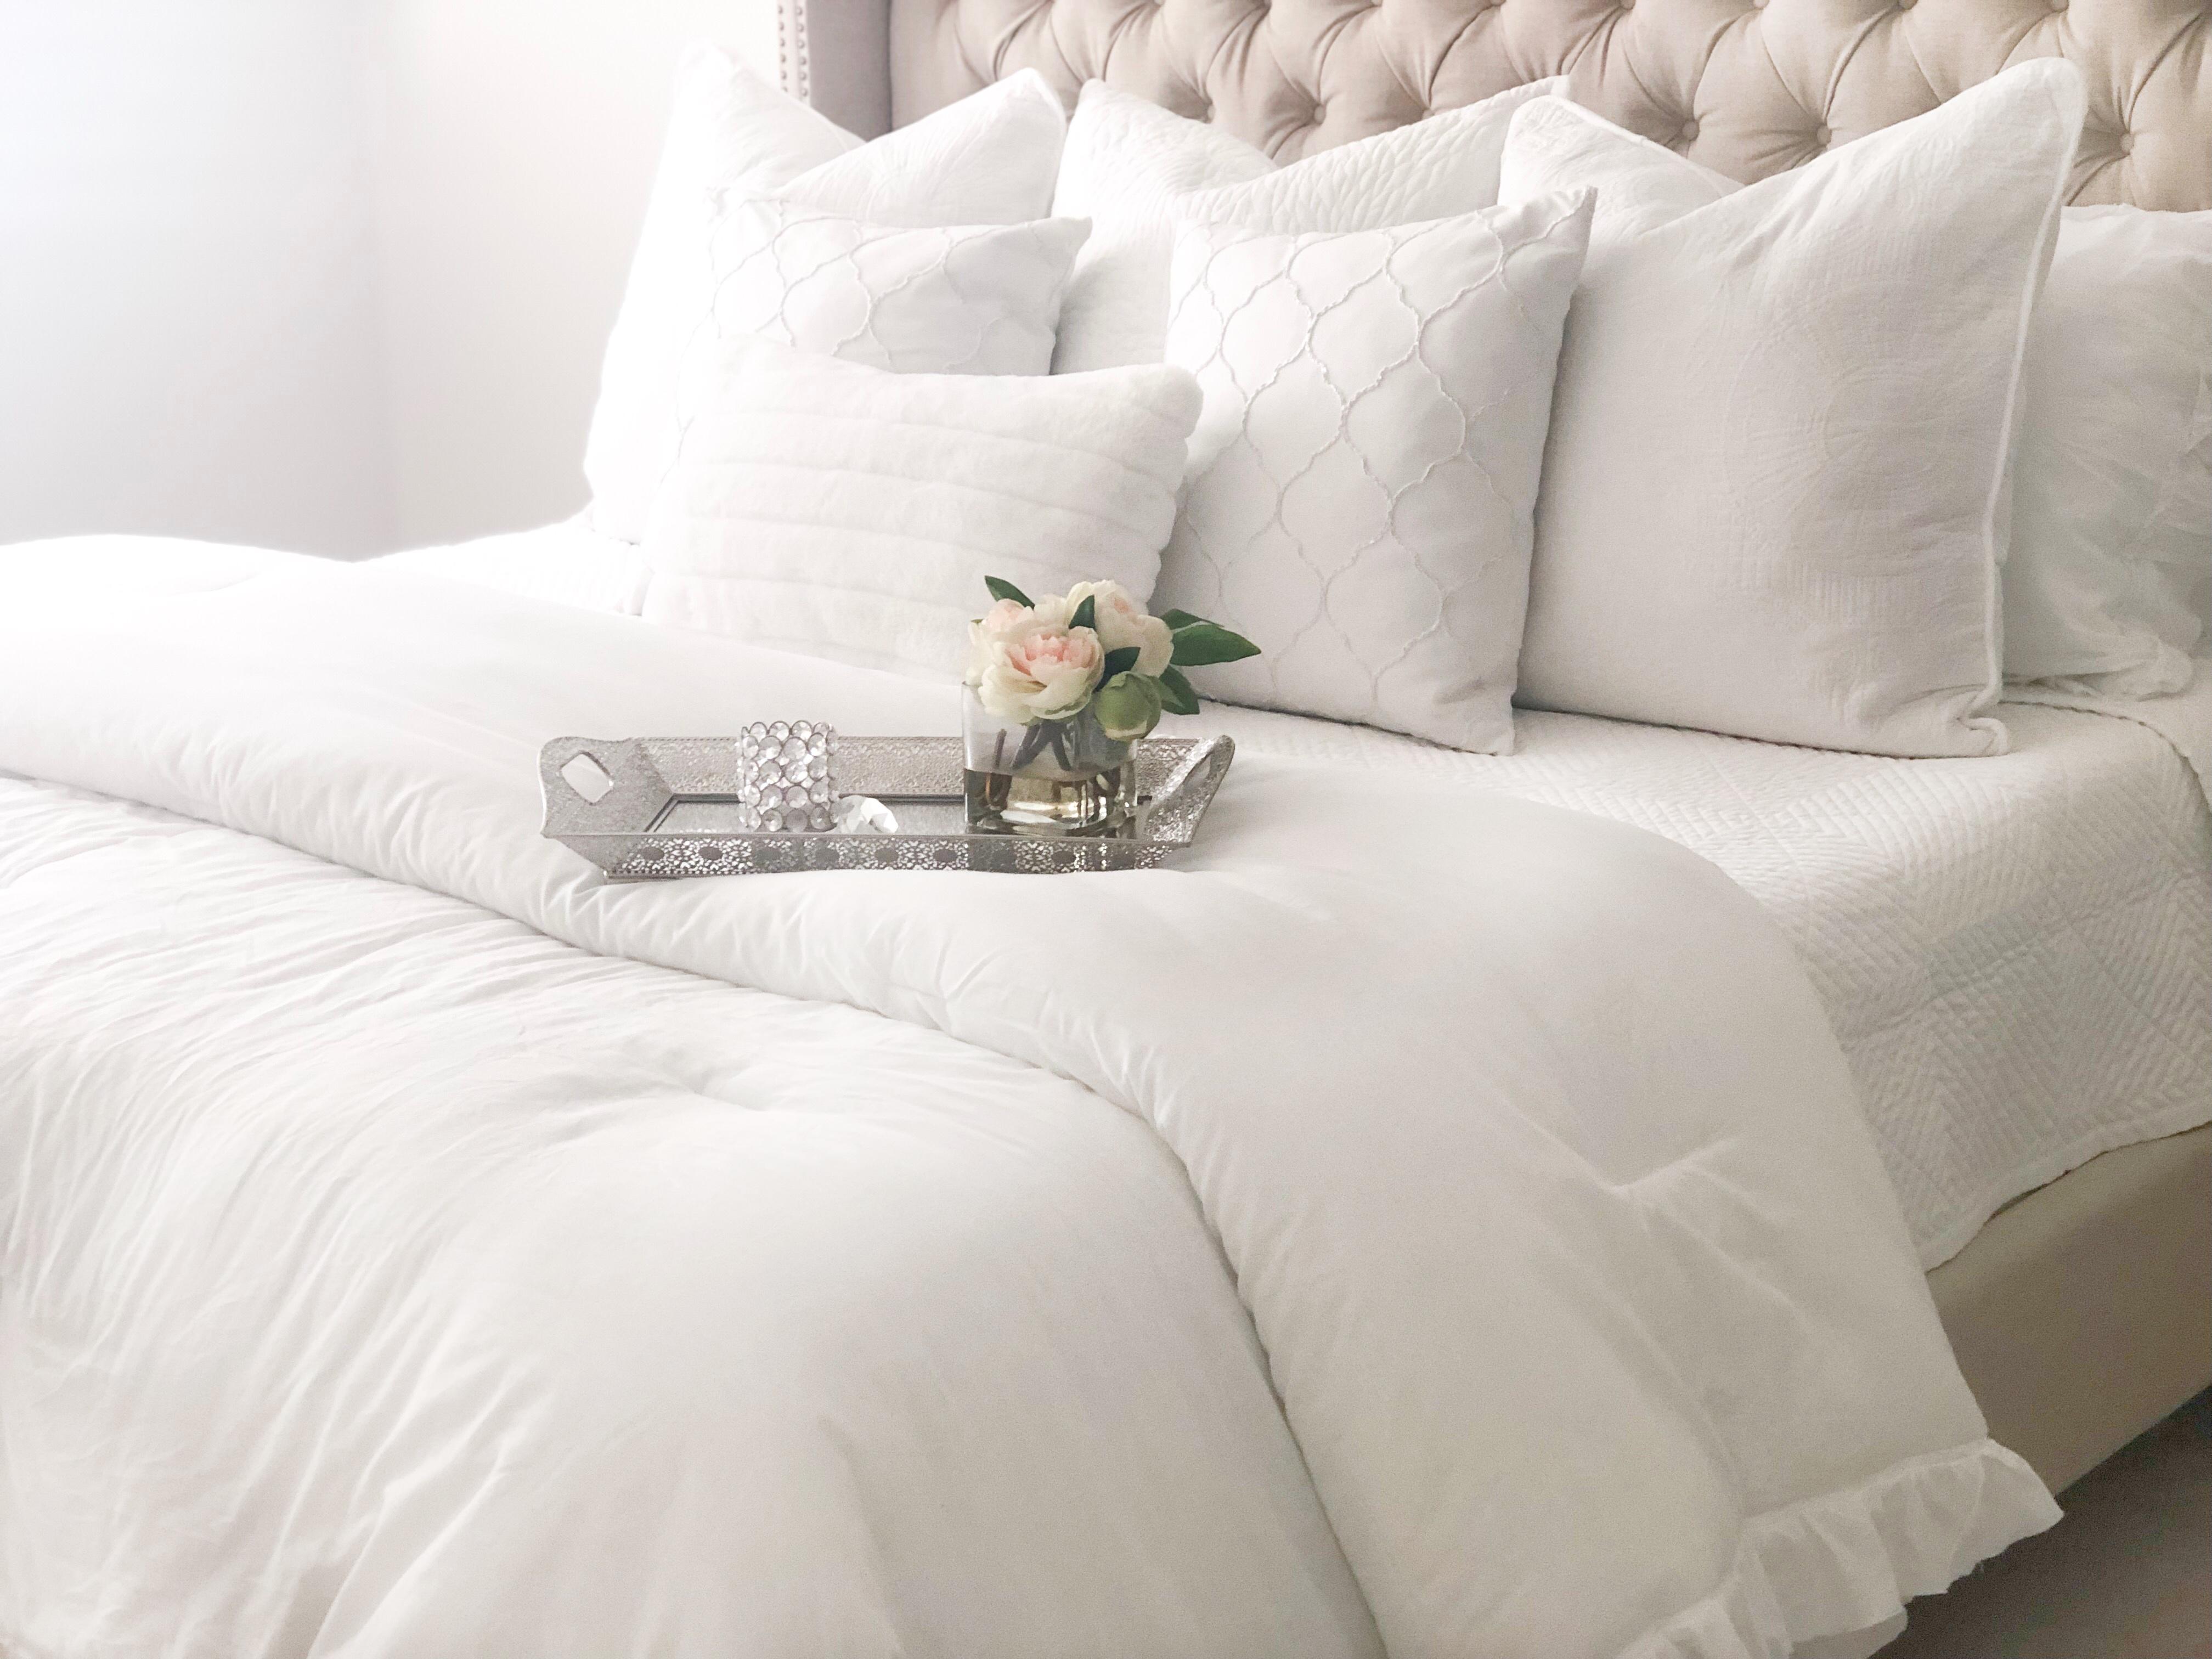 Spring Bedding Refresh From HomeSense!